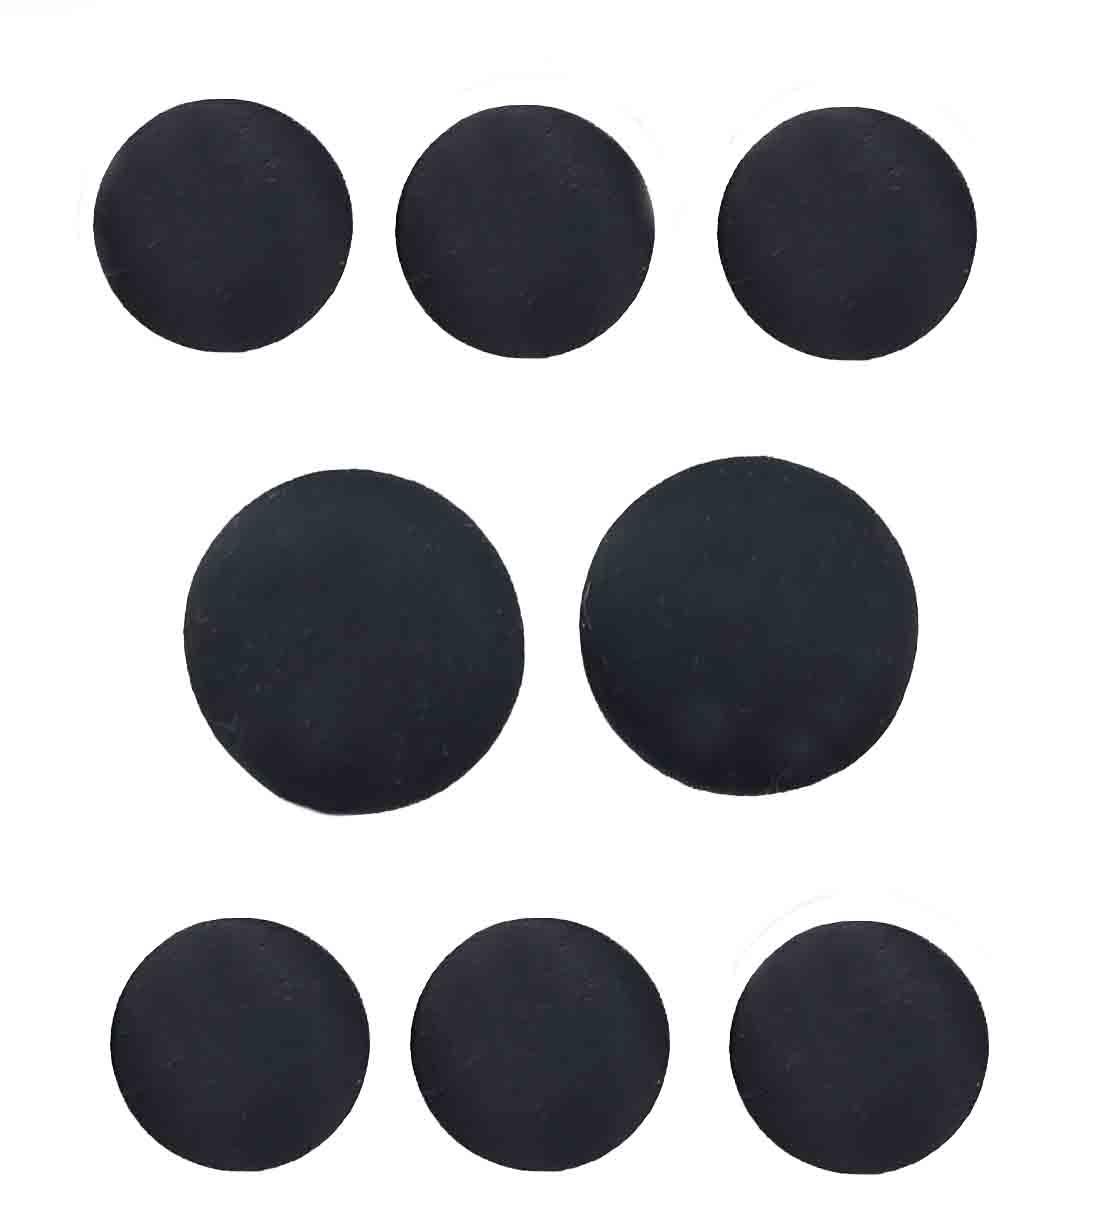 Vintage Jos A Bank Black Satin Tuxedo Jacket Buttons set Men's